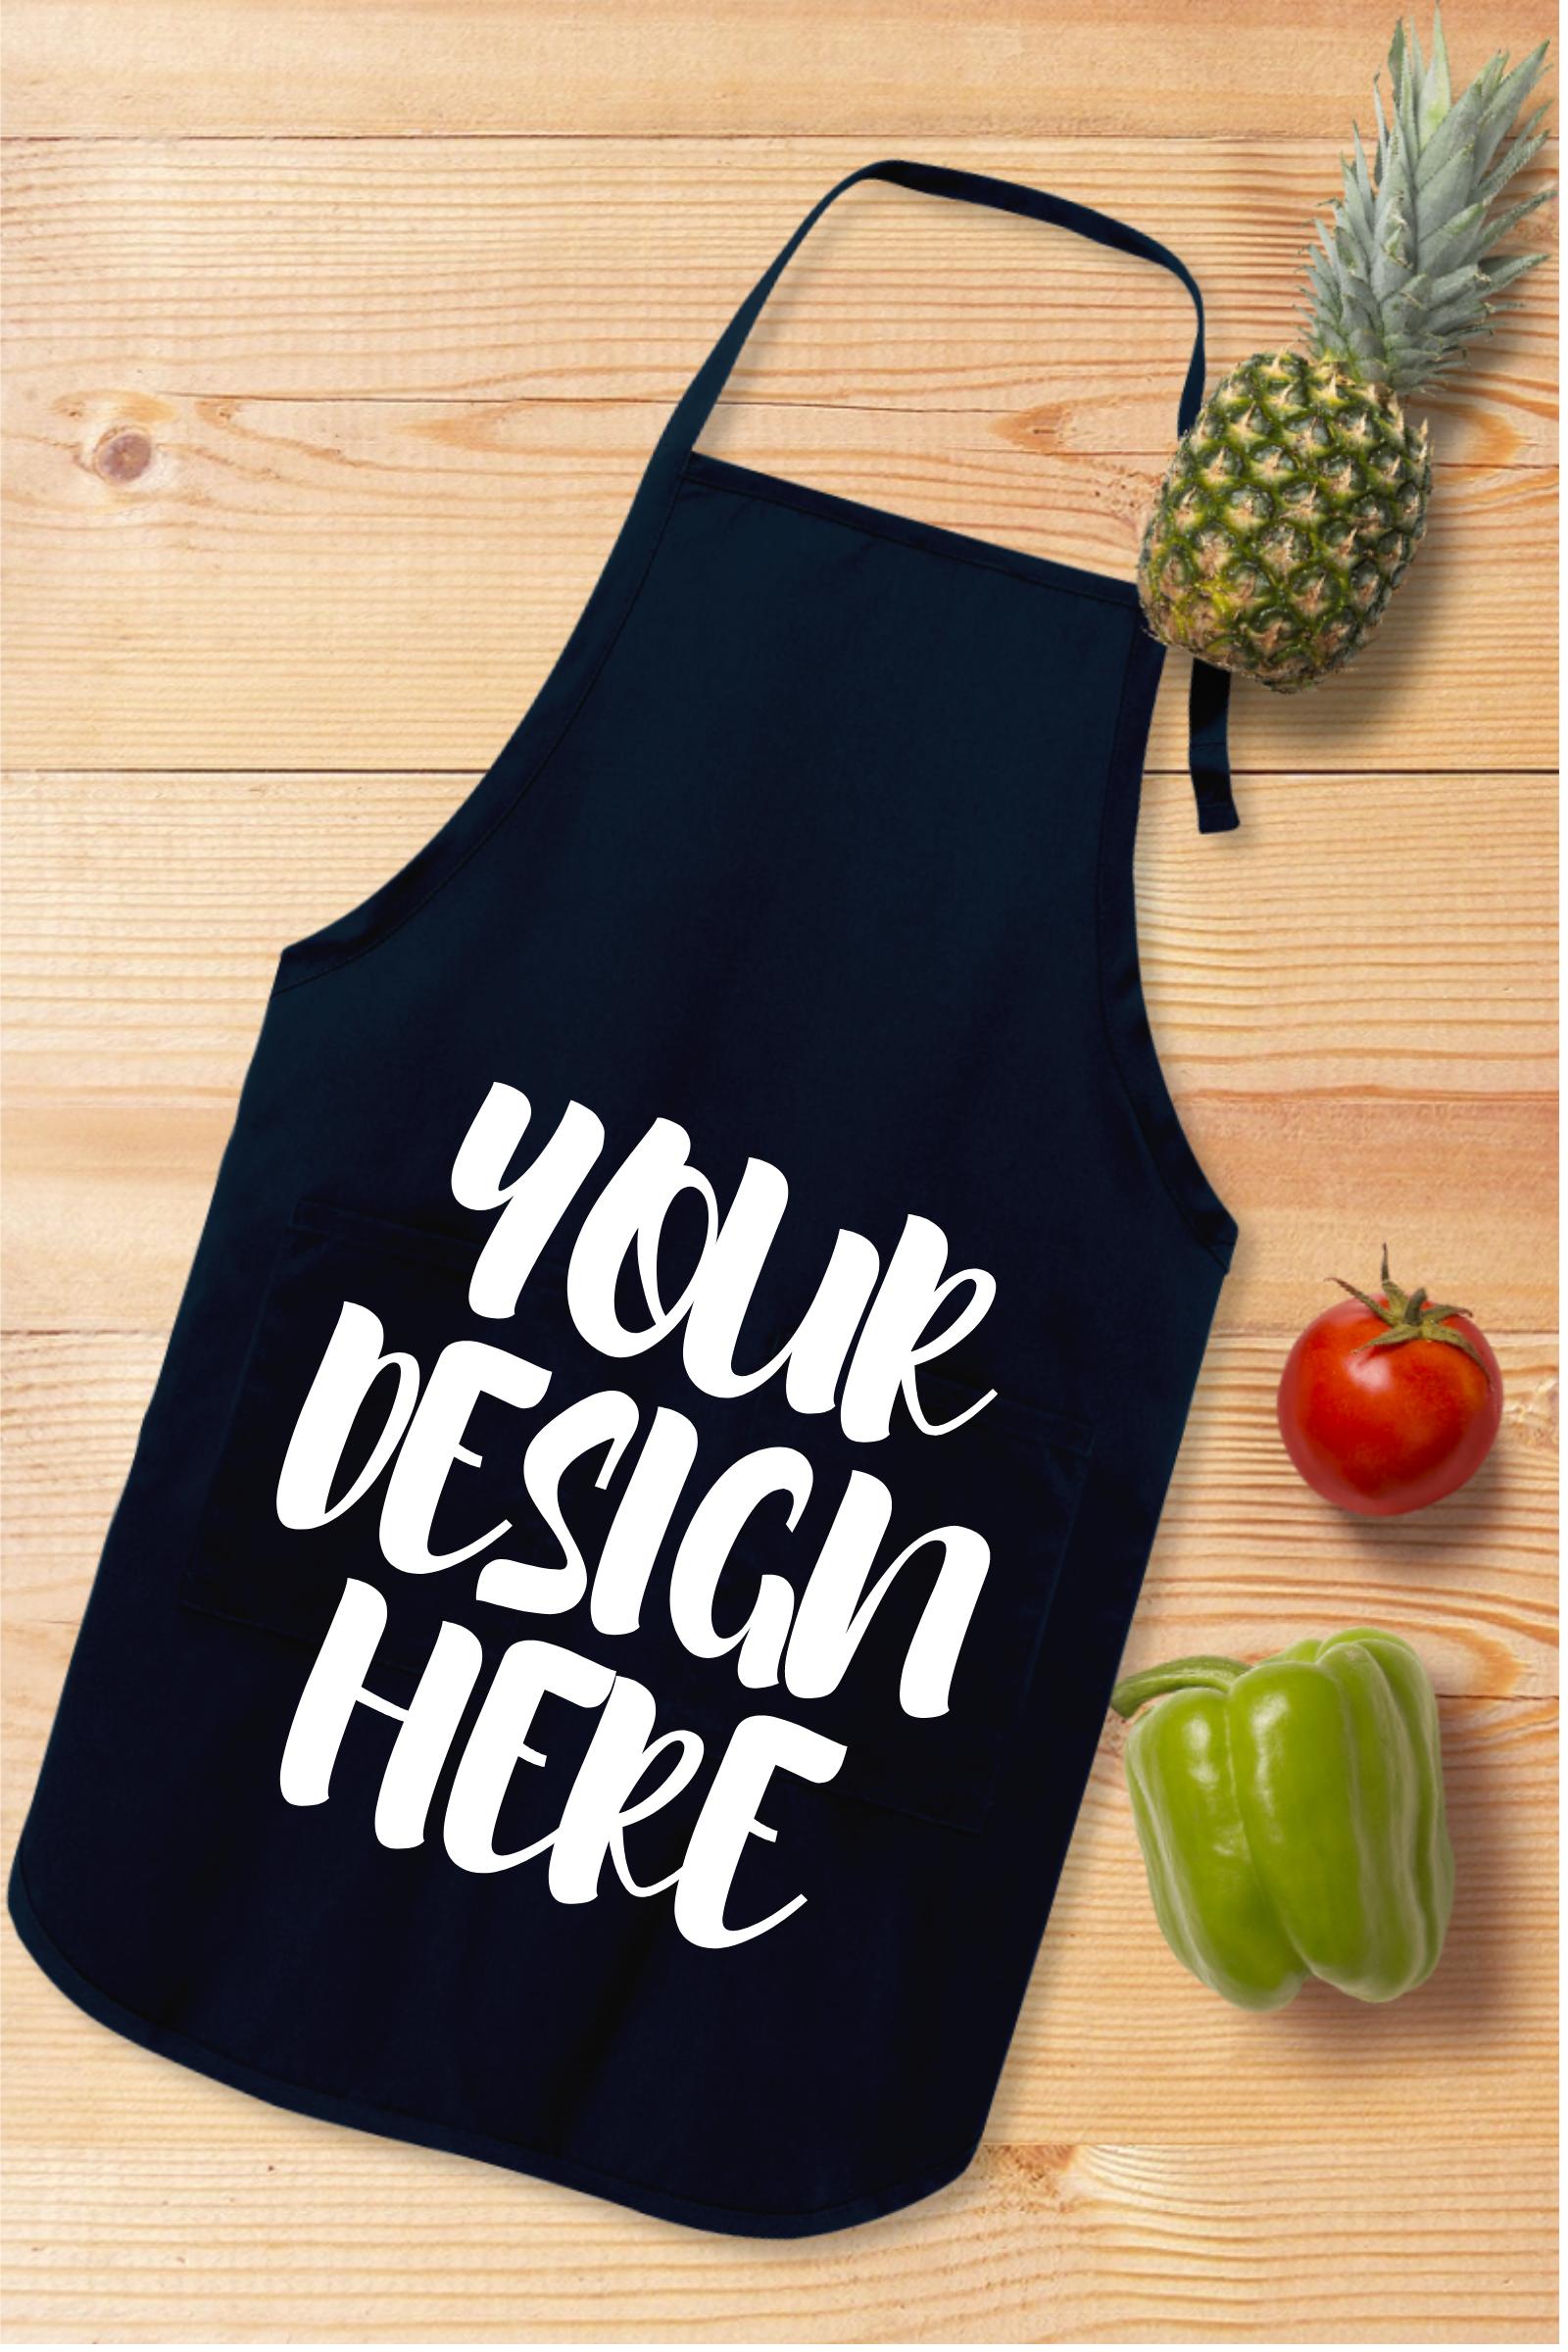 Apron Mock Ups Bundle With Kitchen Theme - 6 example image 3